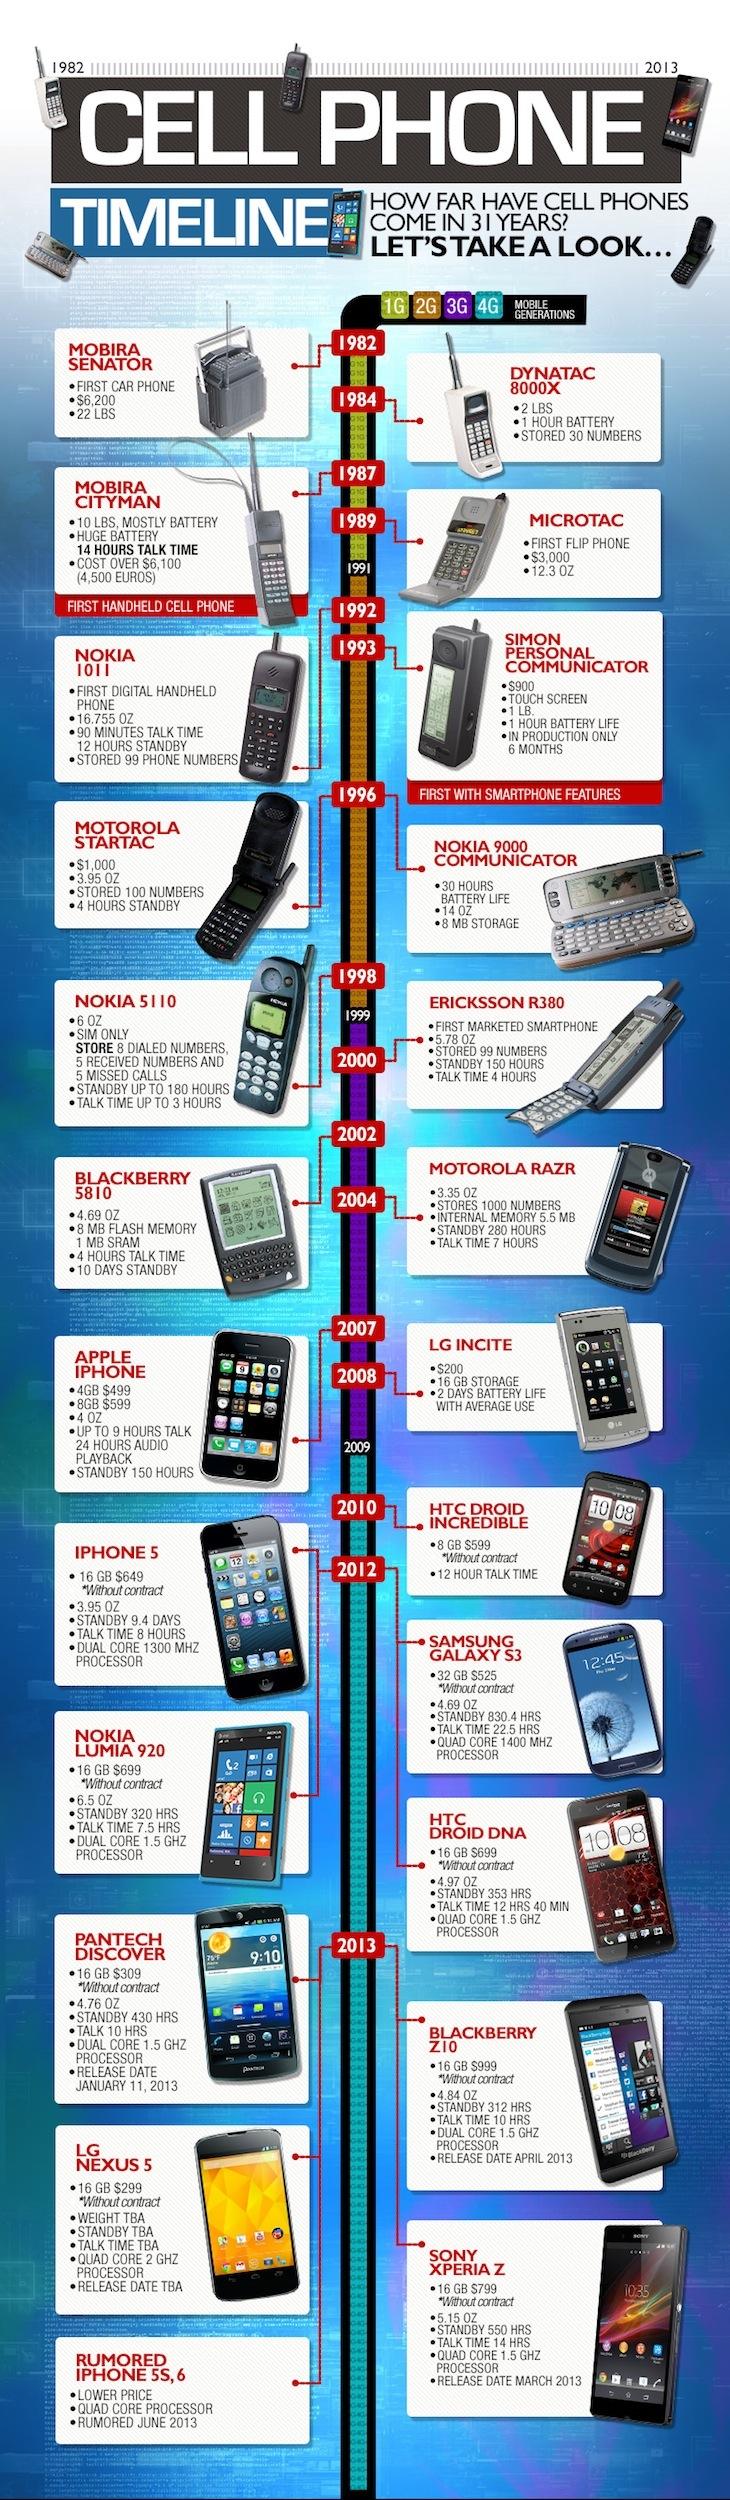 infografia de la historia de los telefonos moviles